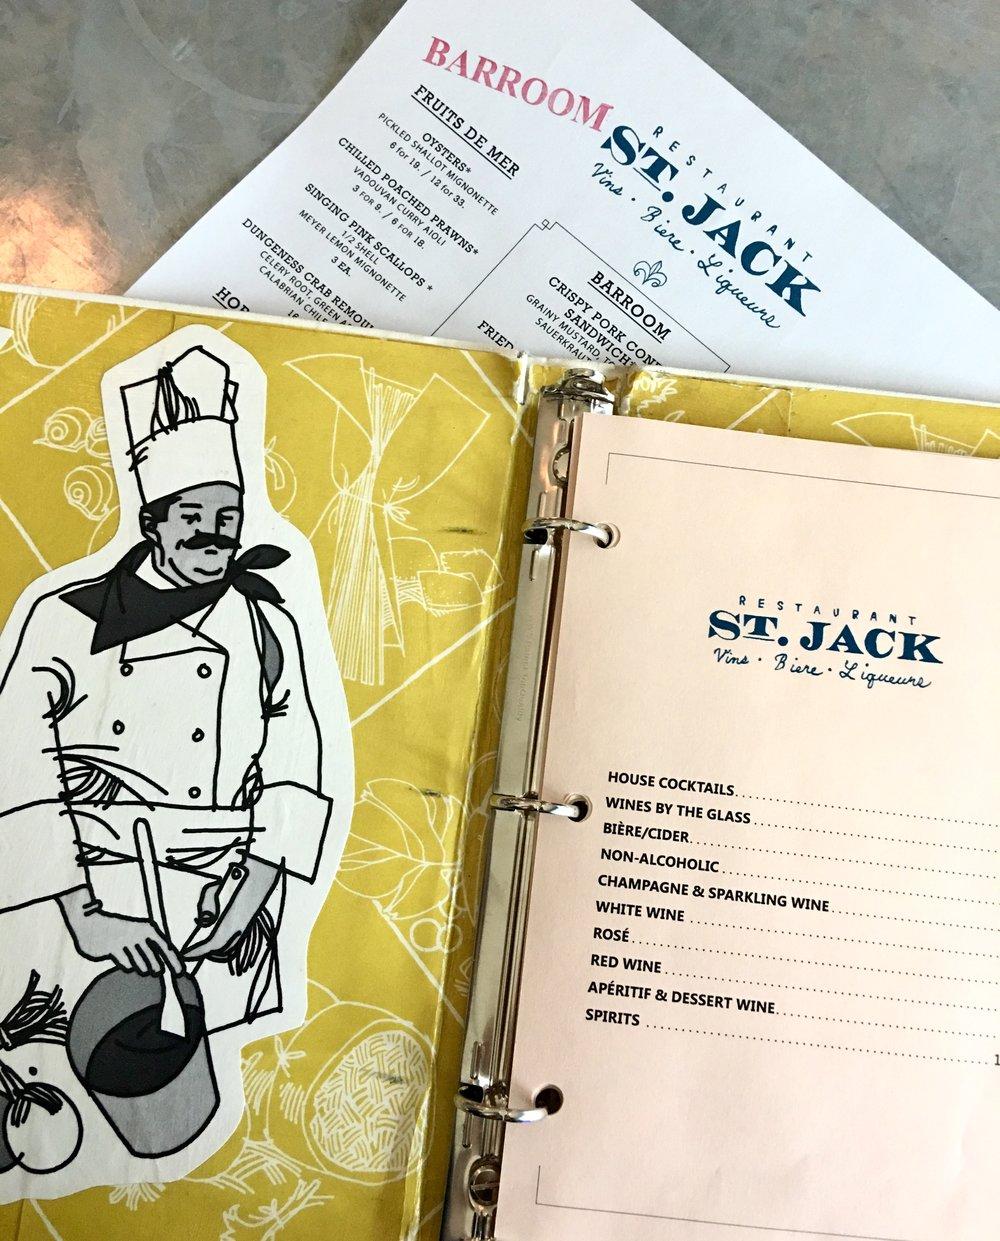 snackface-portlant-st-jack.jpg